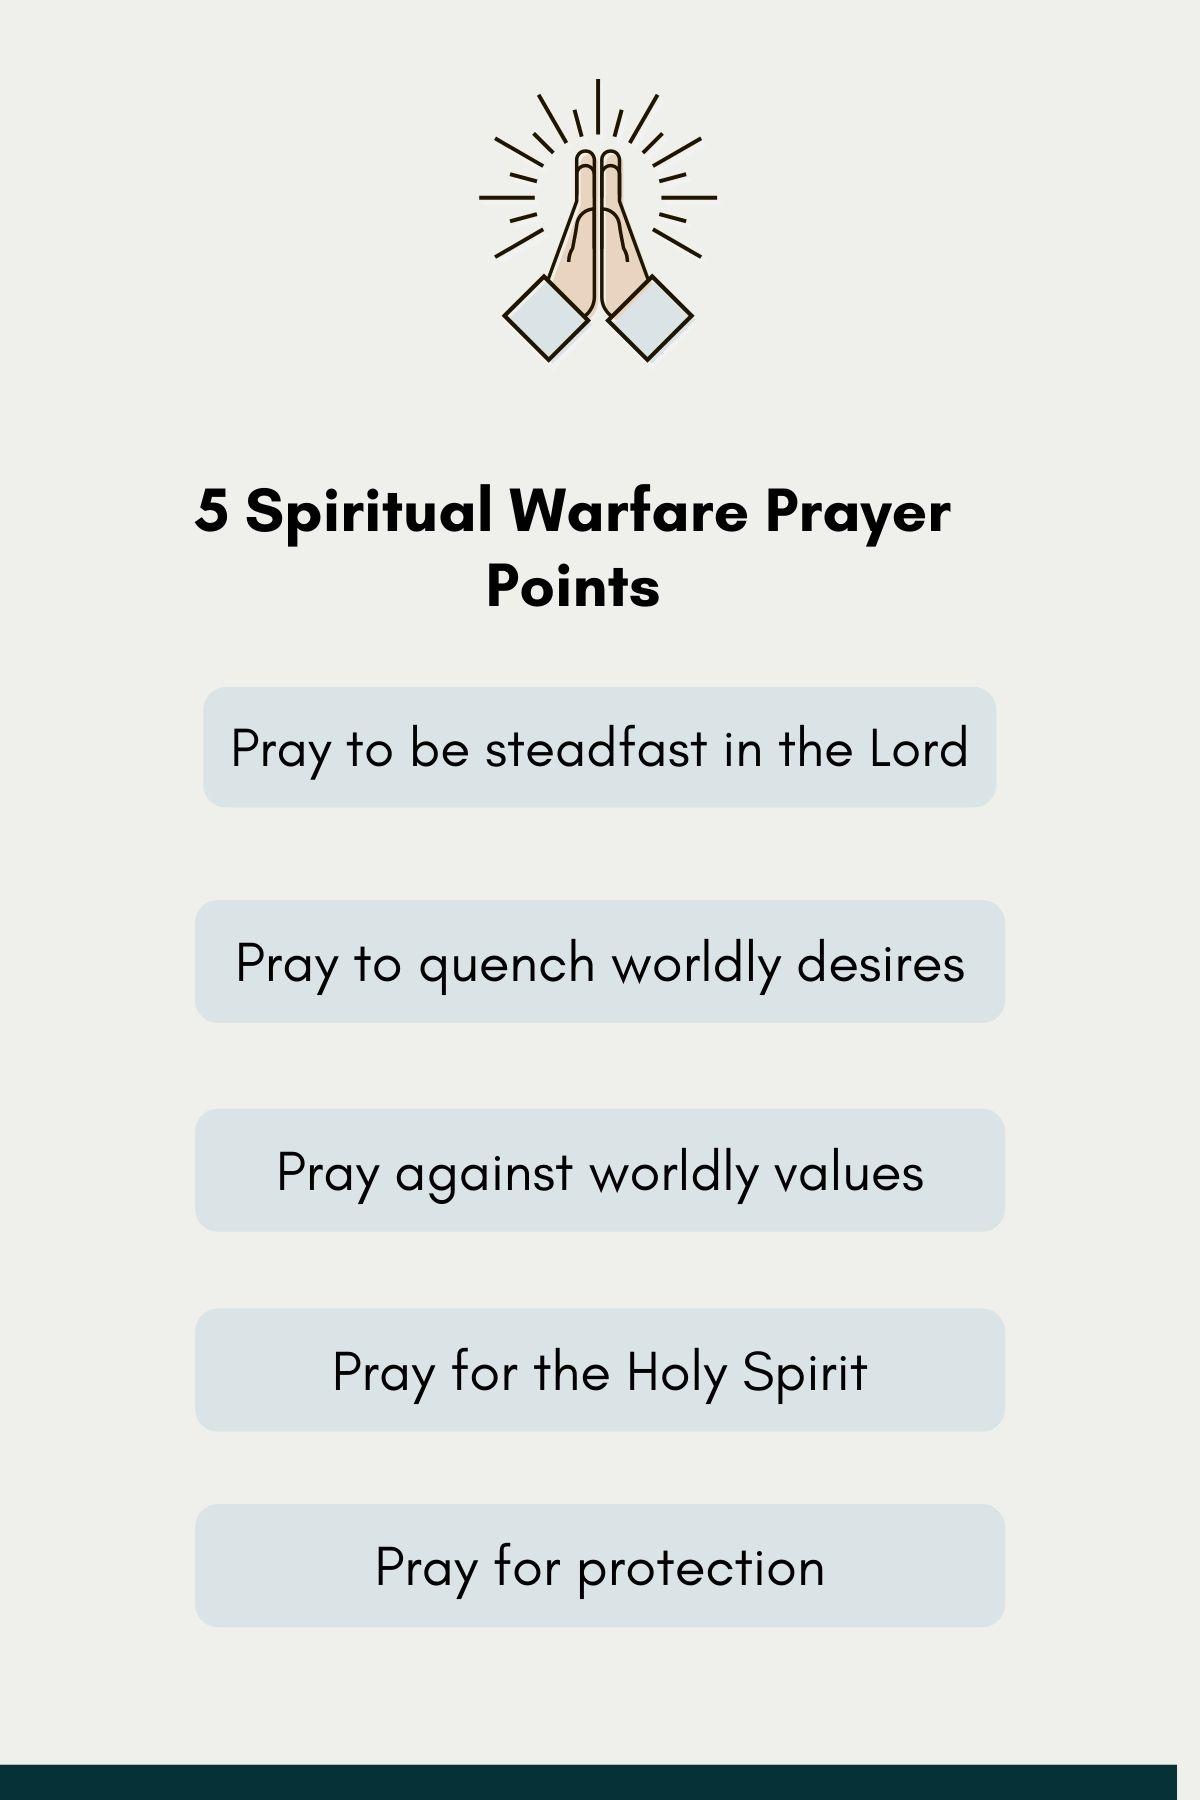 5 spiritual warfare prayer points